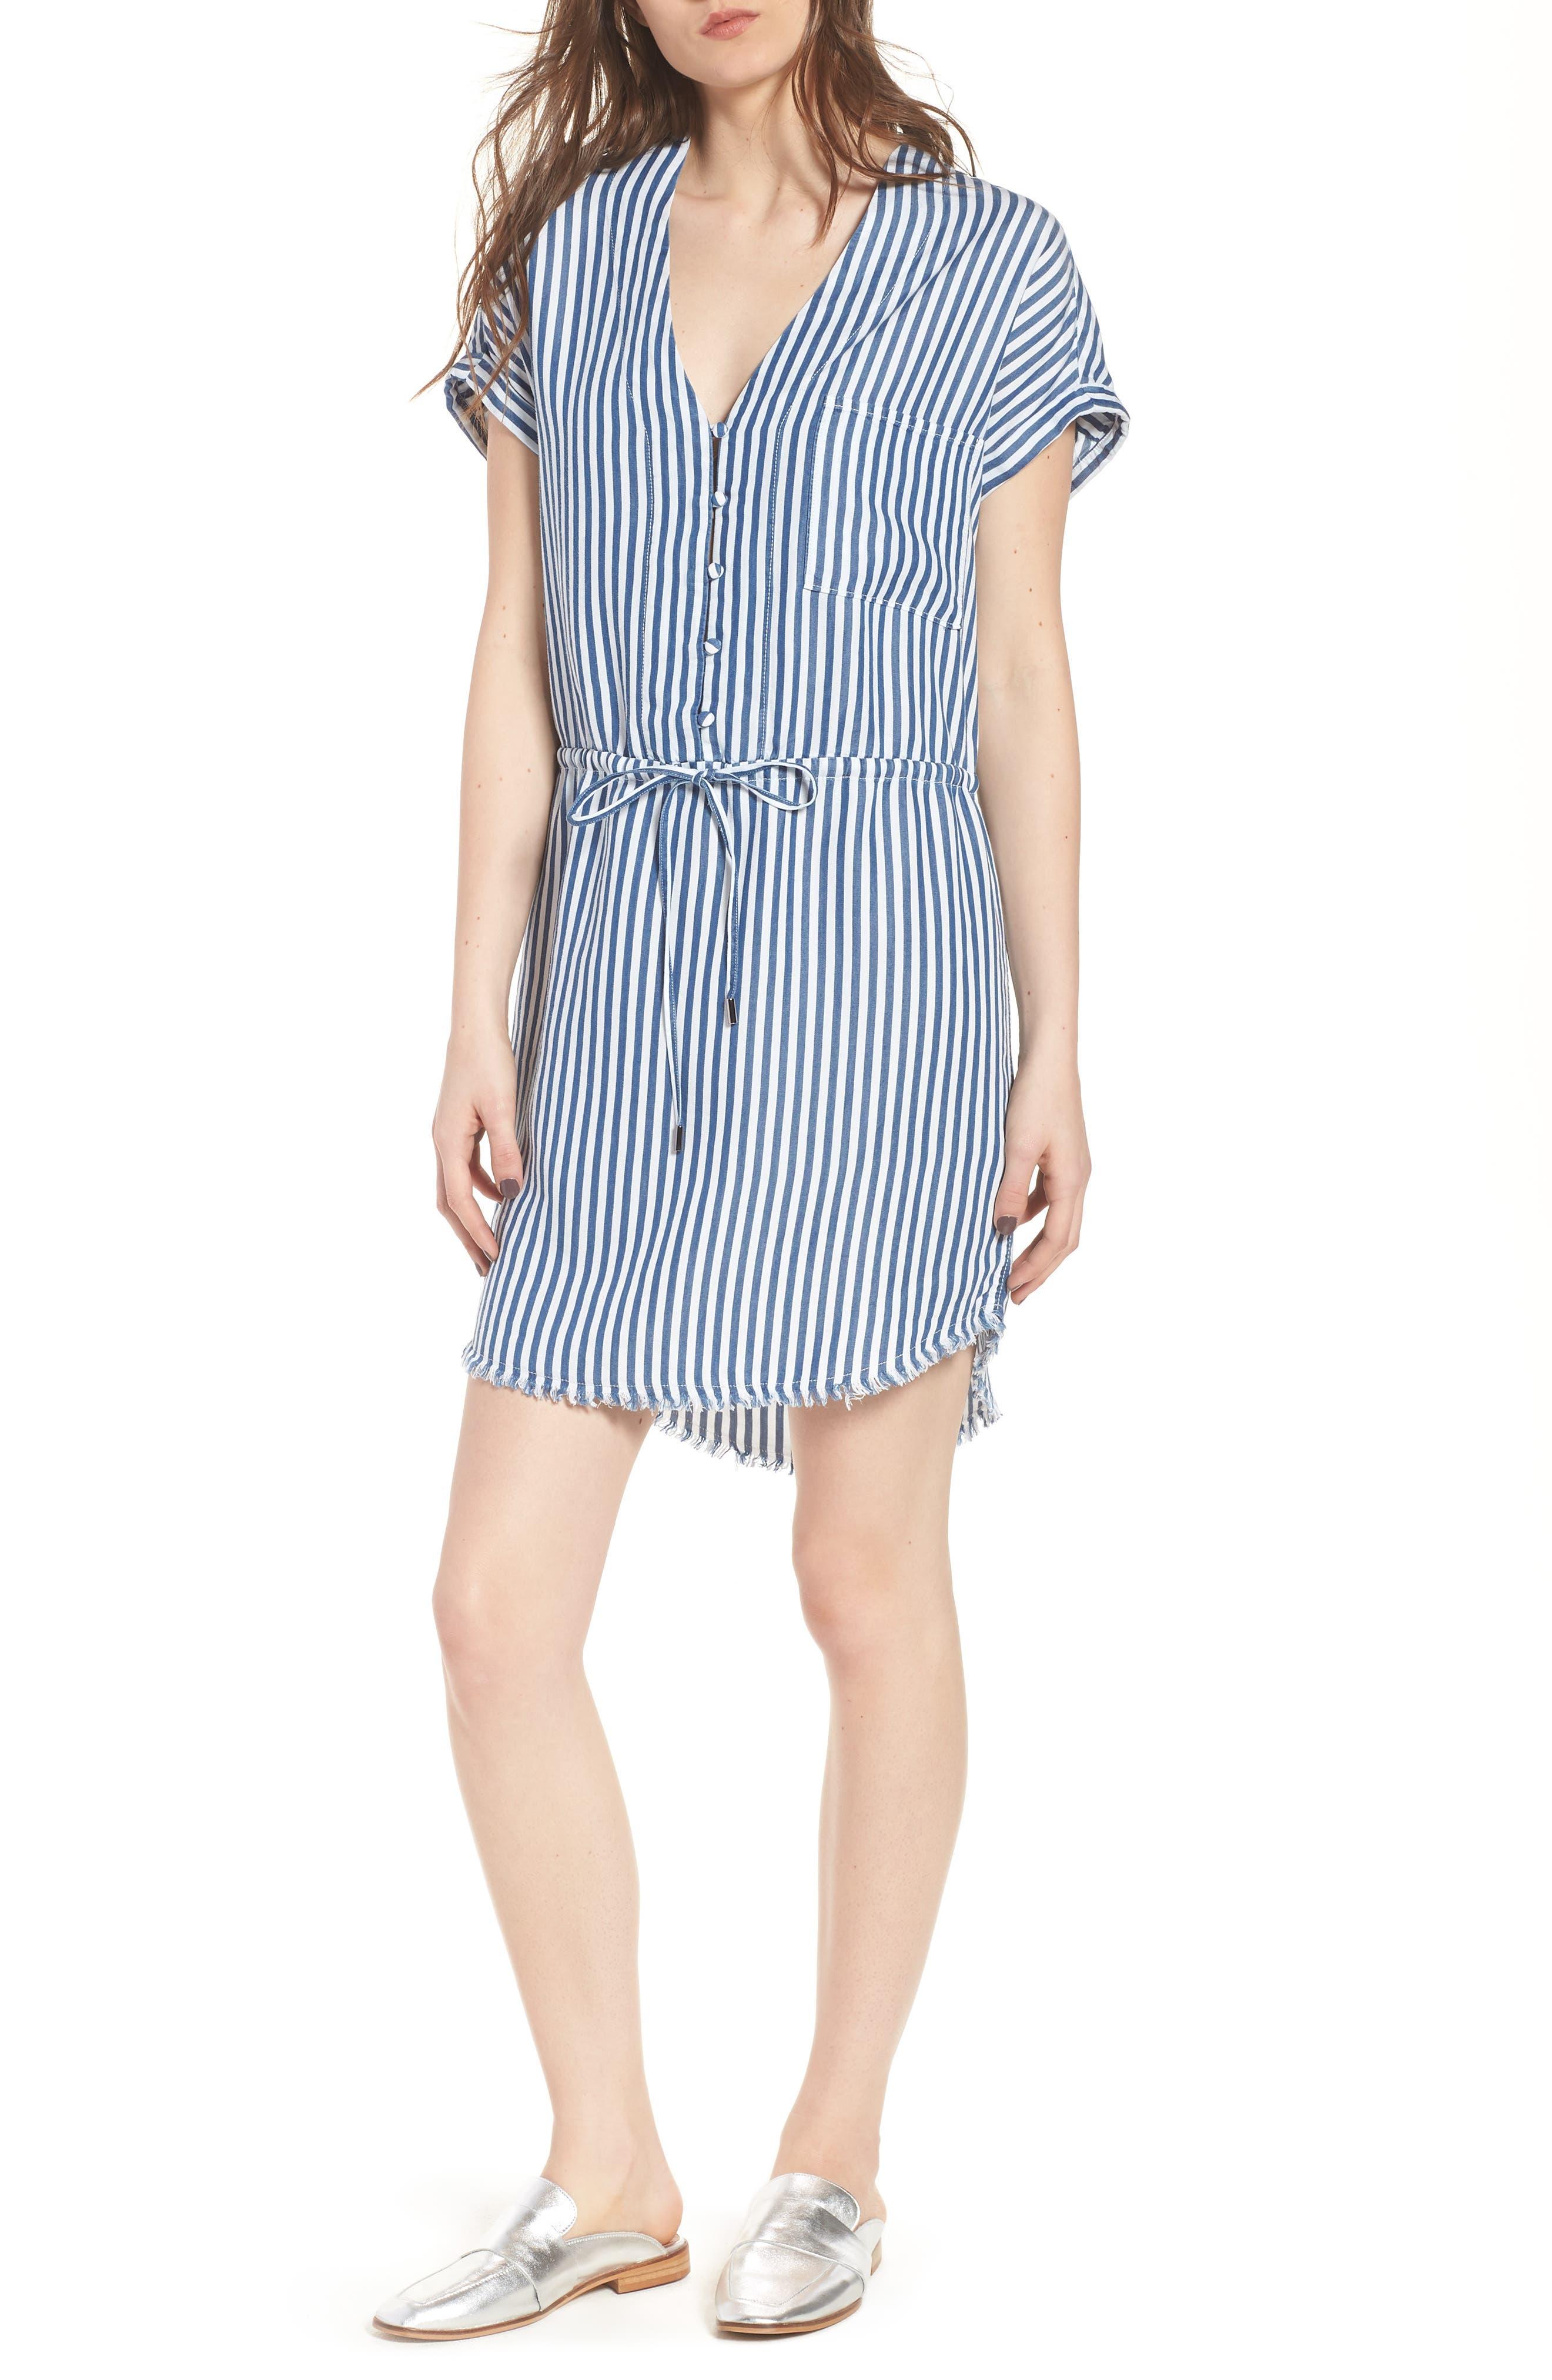 Haidee Stripe Shift Dress,                             Main thumbnail 1, color,                             WHITE/ BLUE BELL STRIPE